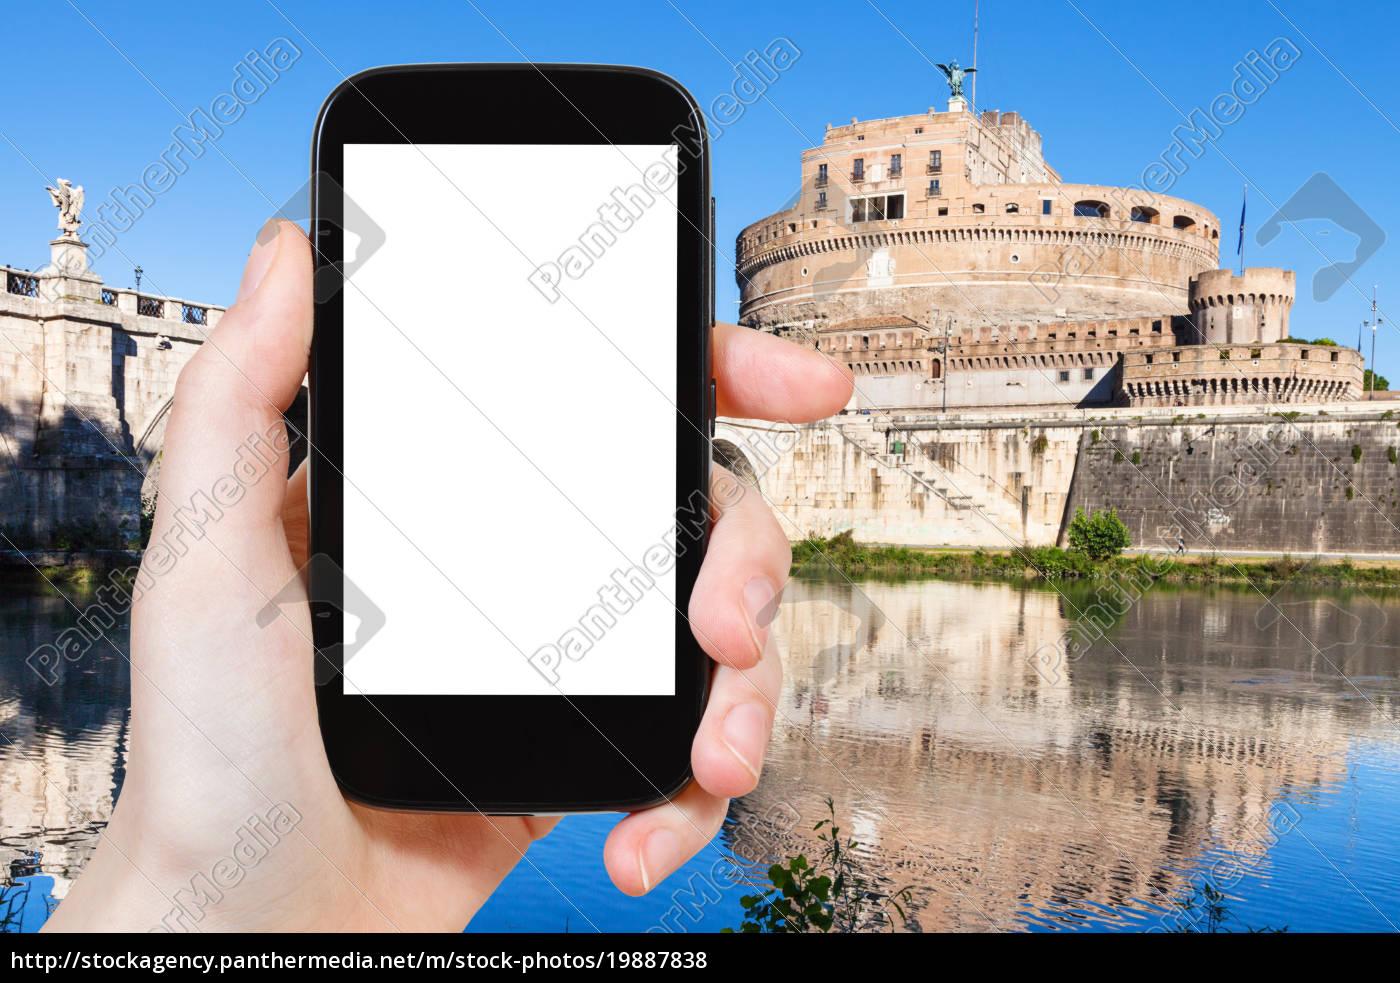 Stock Bild 19887838 Touristen Fotografieren Heilig Engels Schloss In Rom